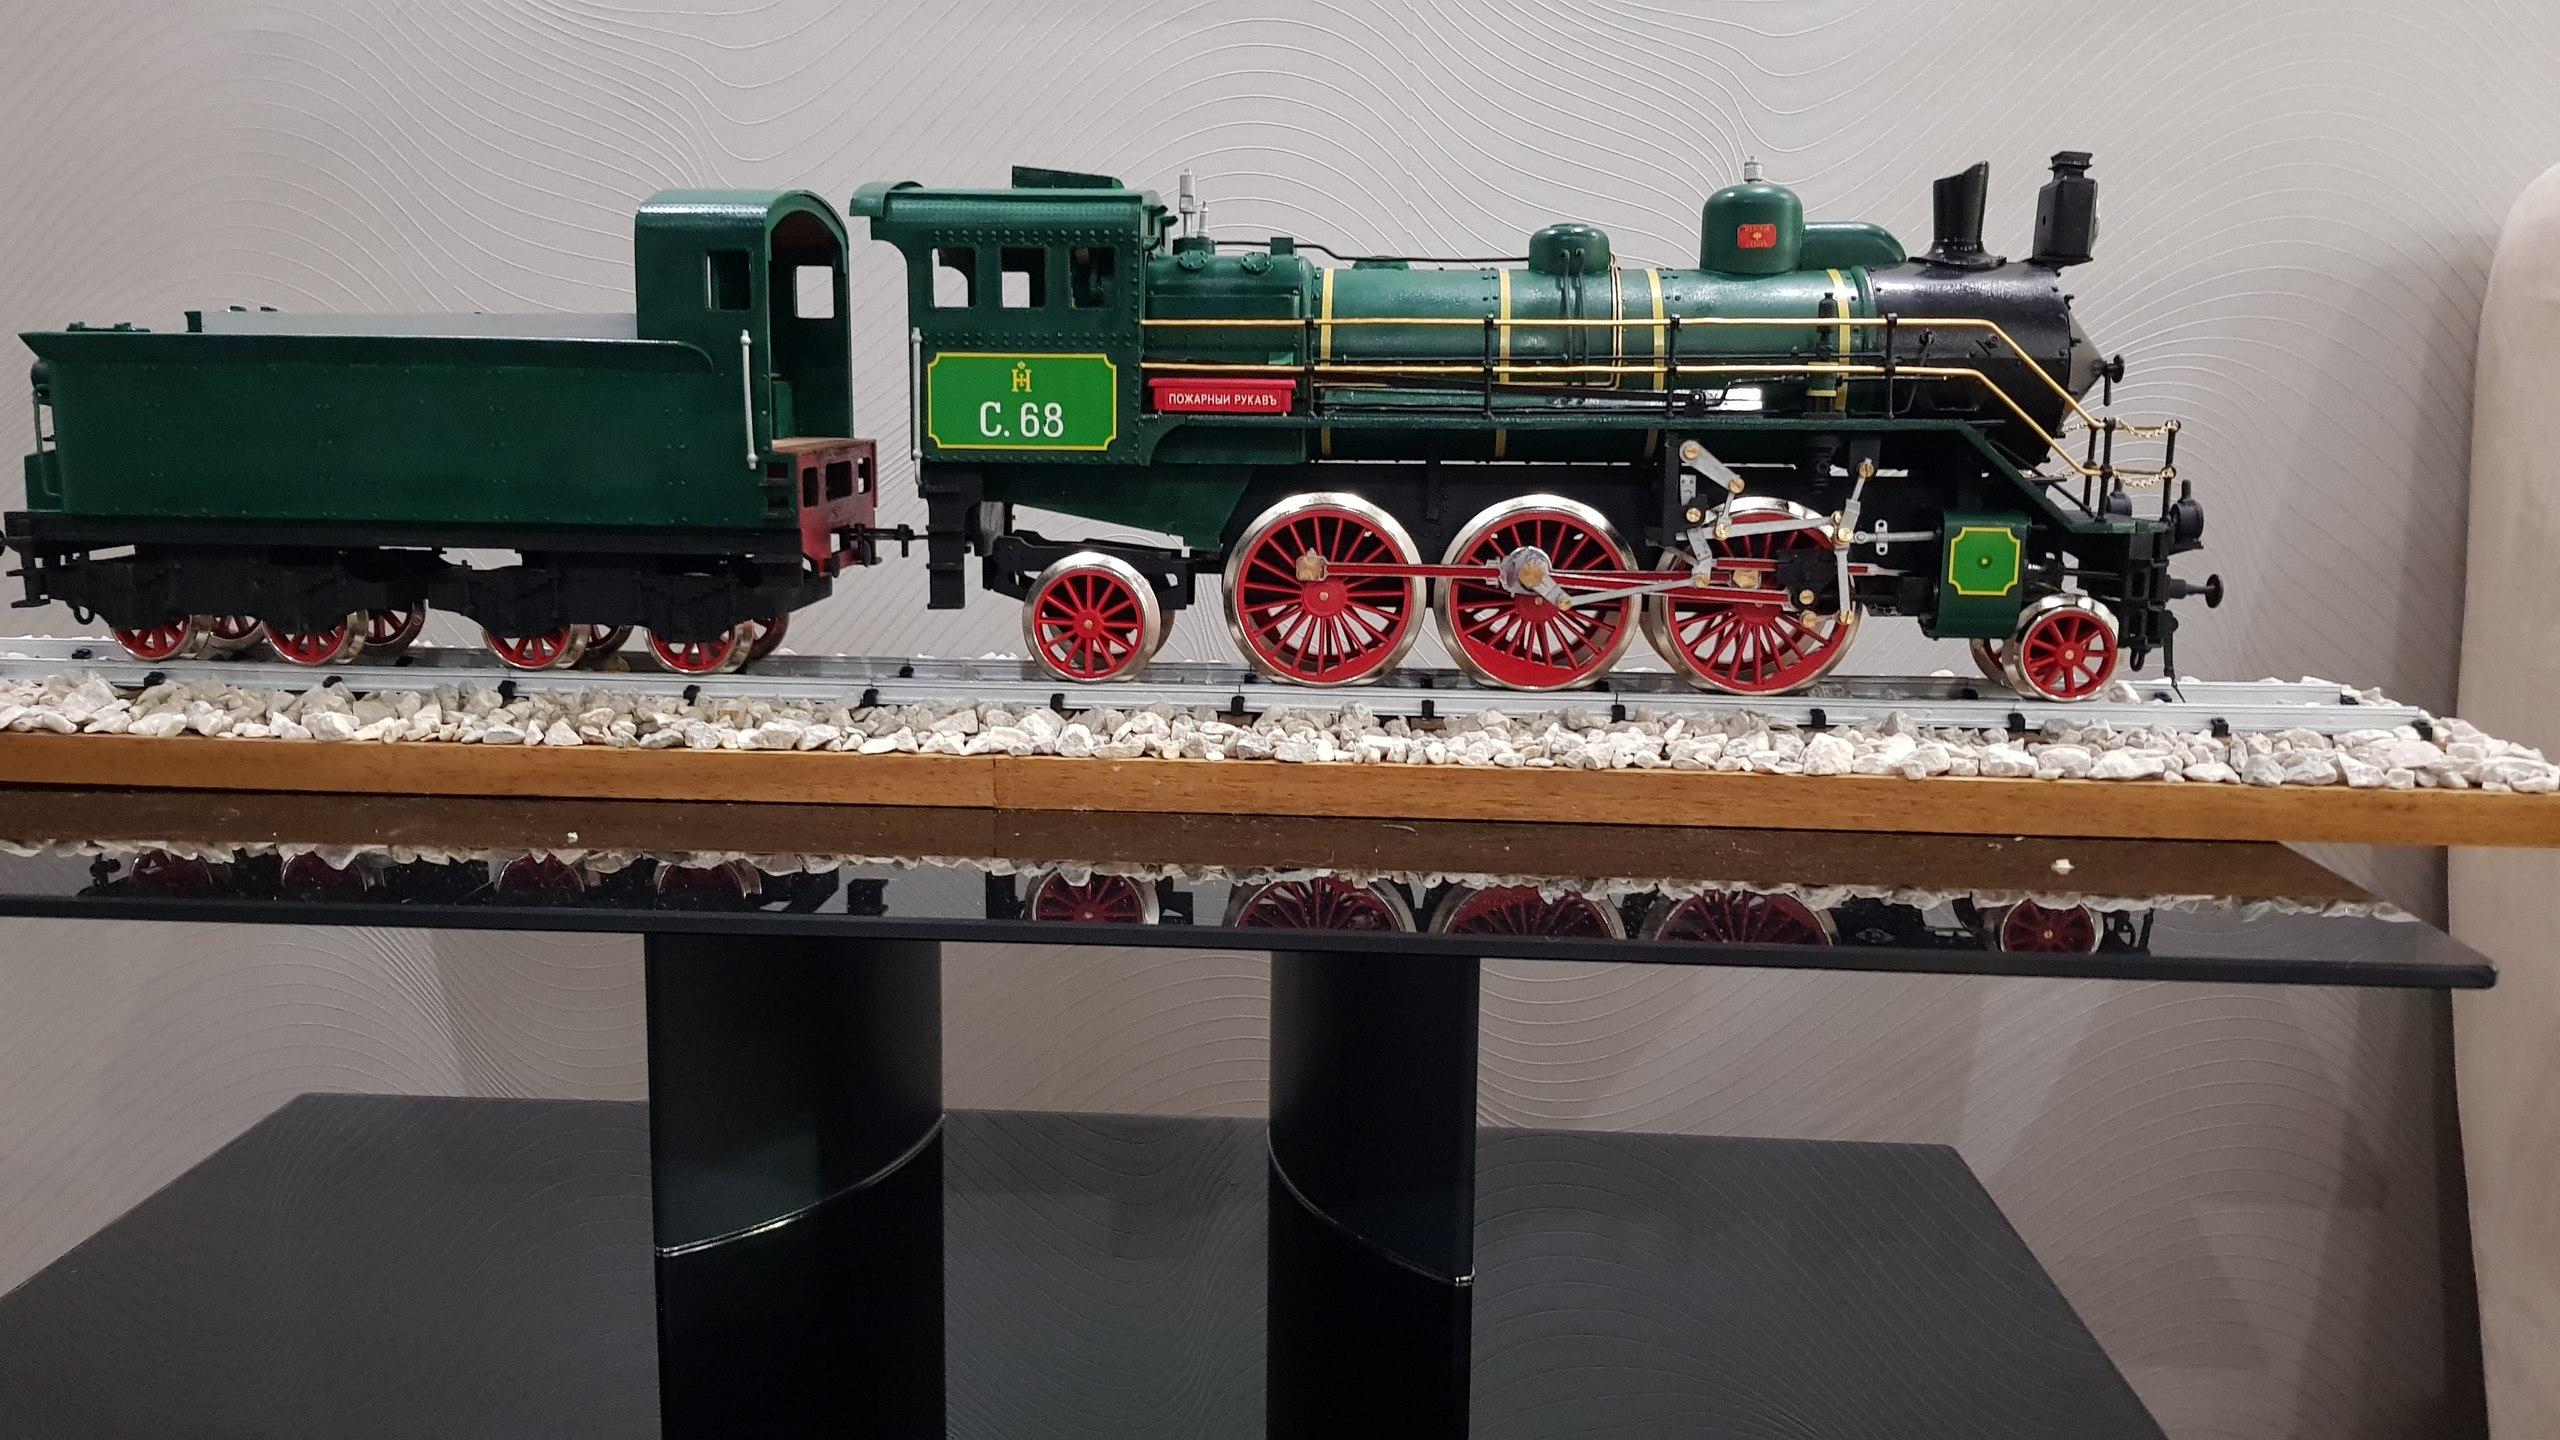 Модель паровоза С-68 масштаб 1:32 QAbVlMb7r3w